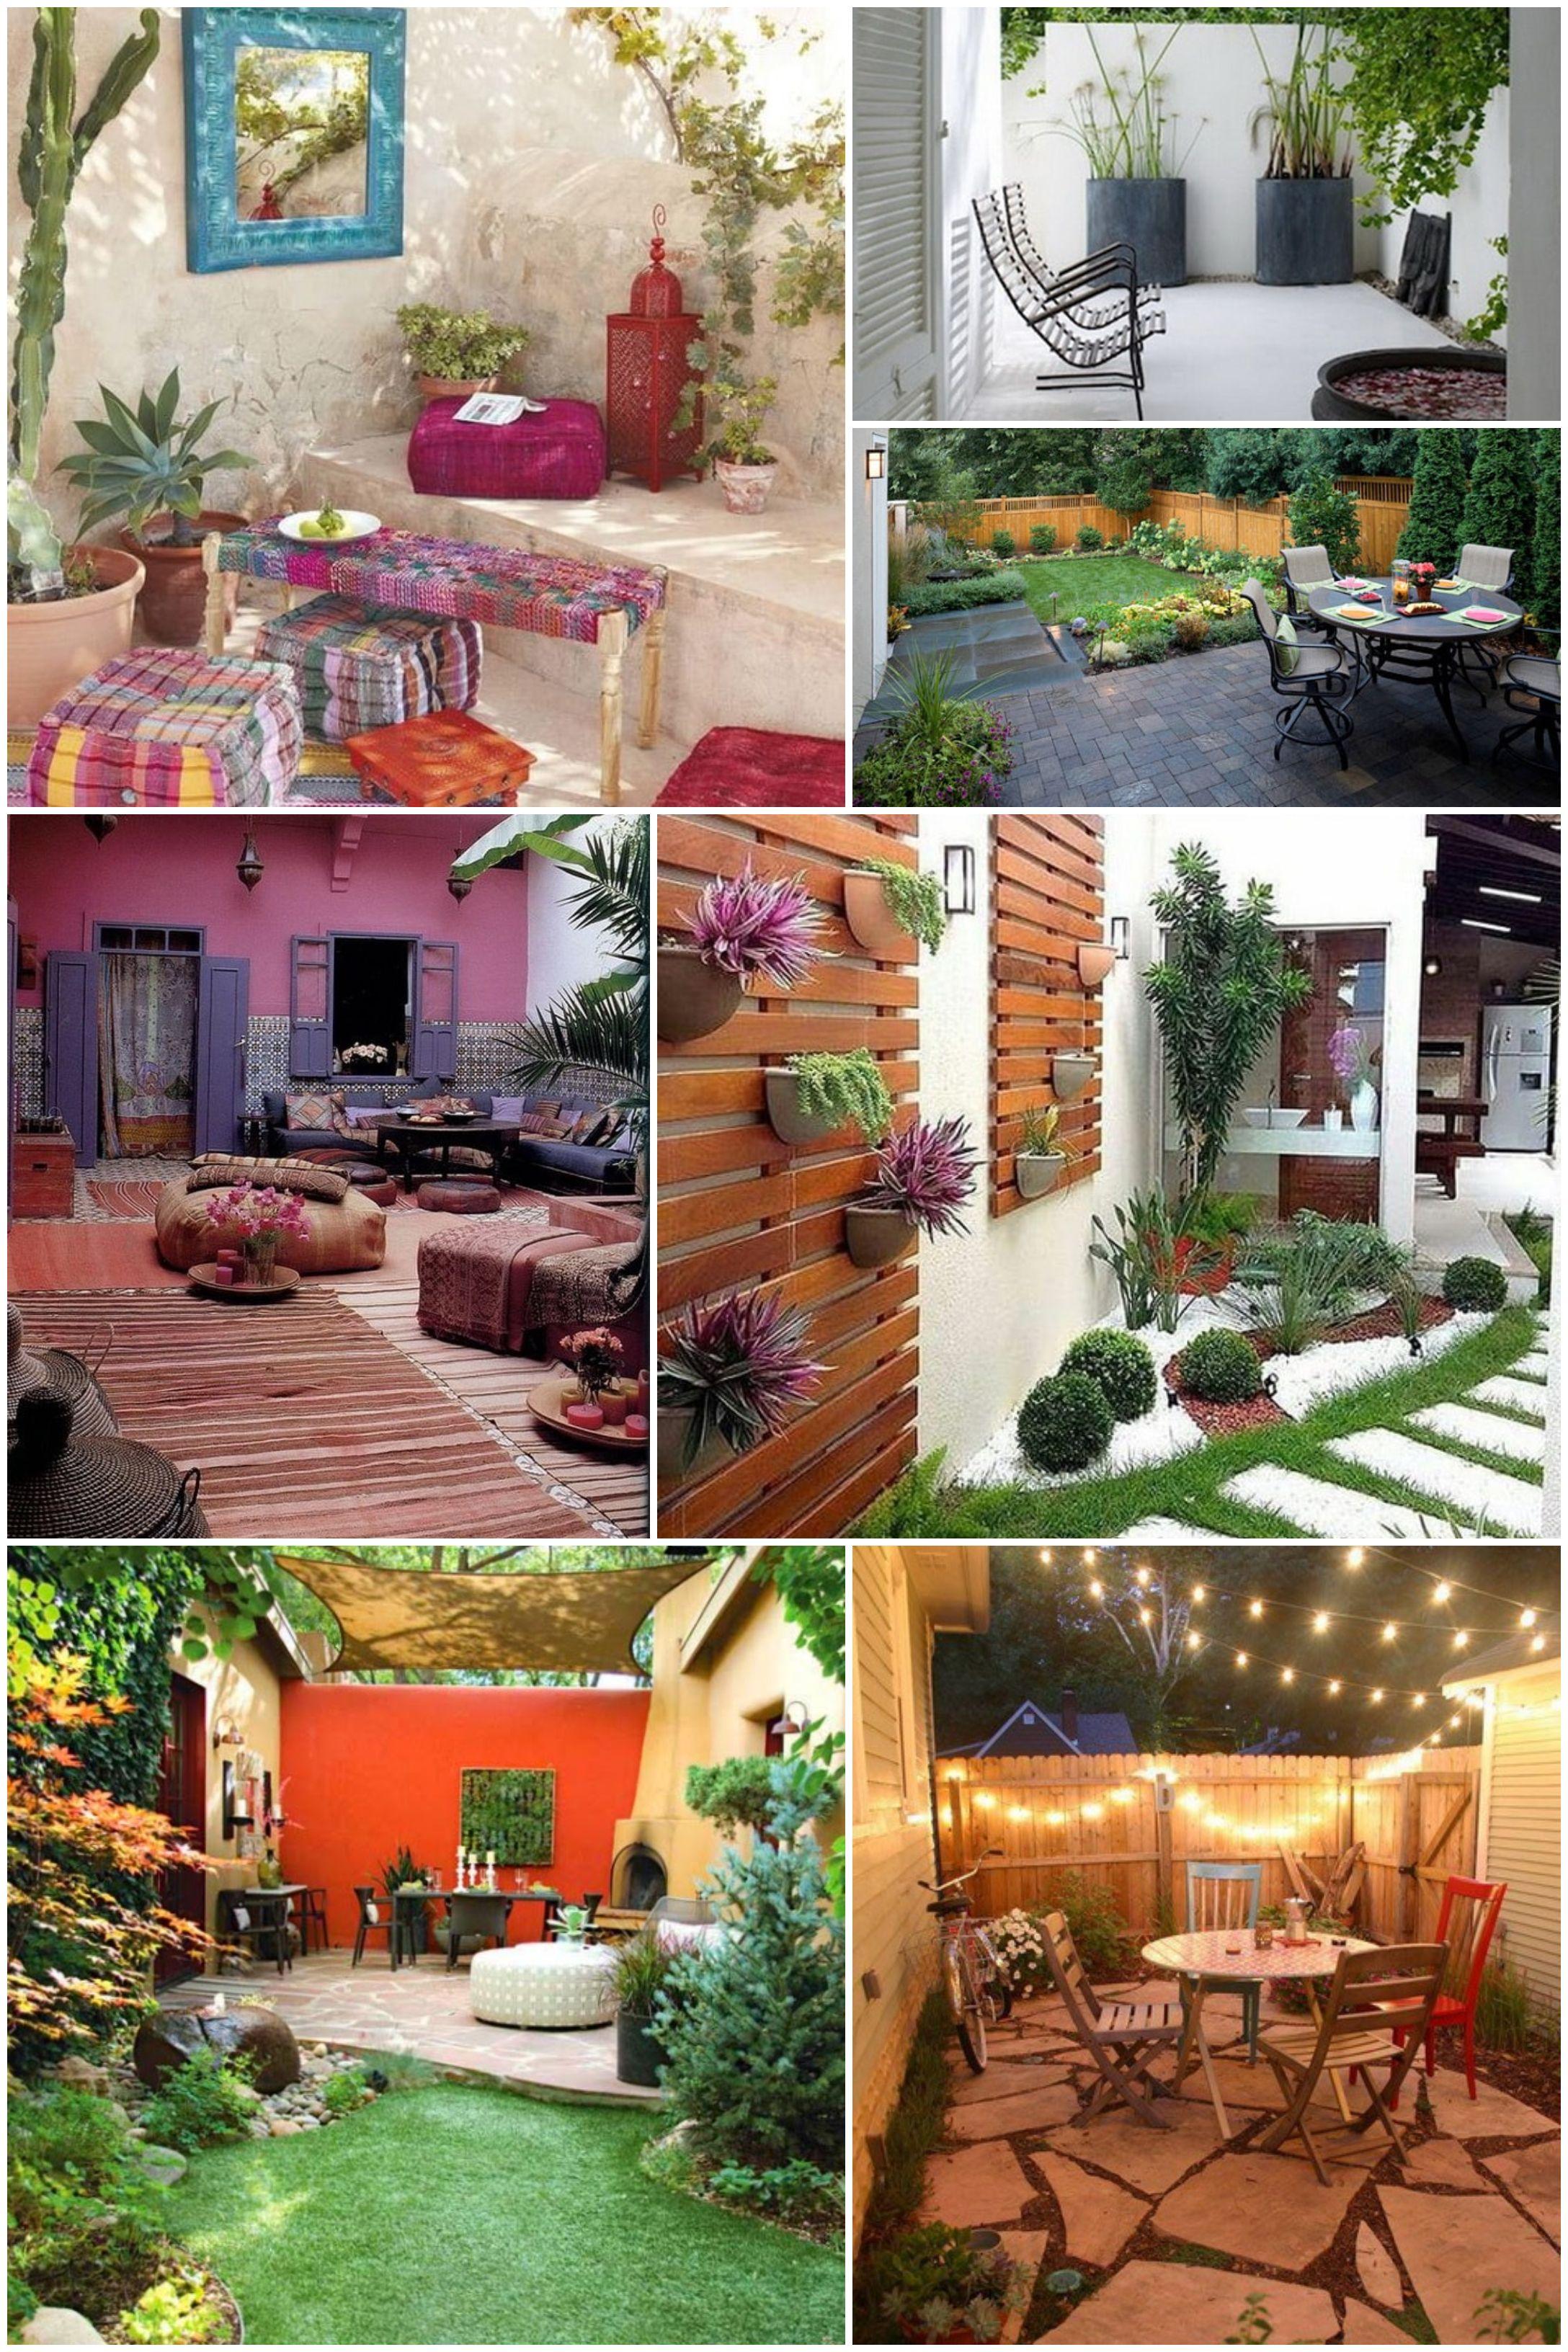 Ideas Para Patios Pequenos Decoracion De Jardines Pequenos Decoracion Jardines Pequenos Diseno De Patio Decorar Patio Pequeno